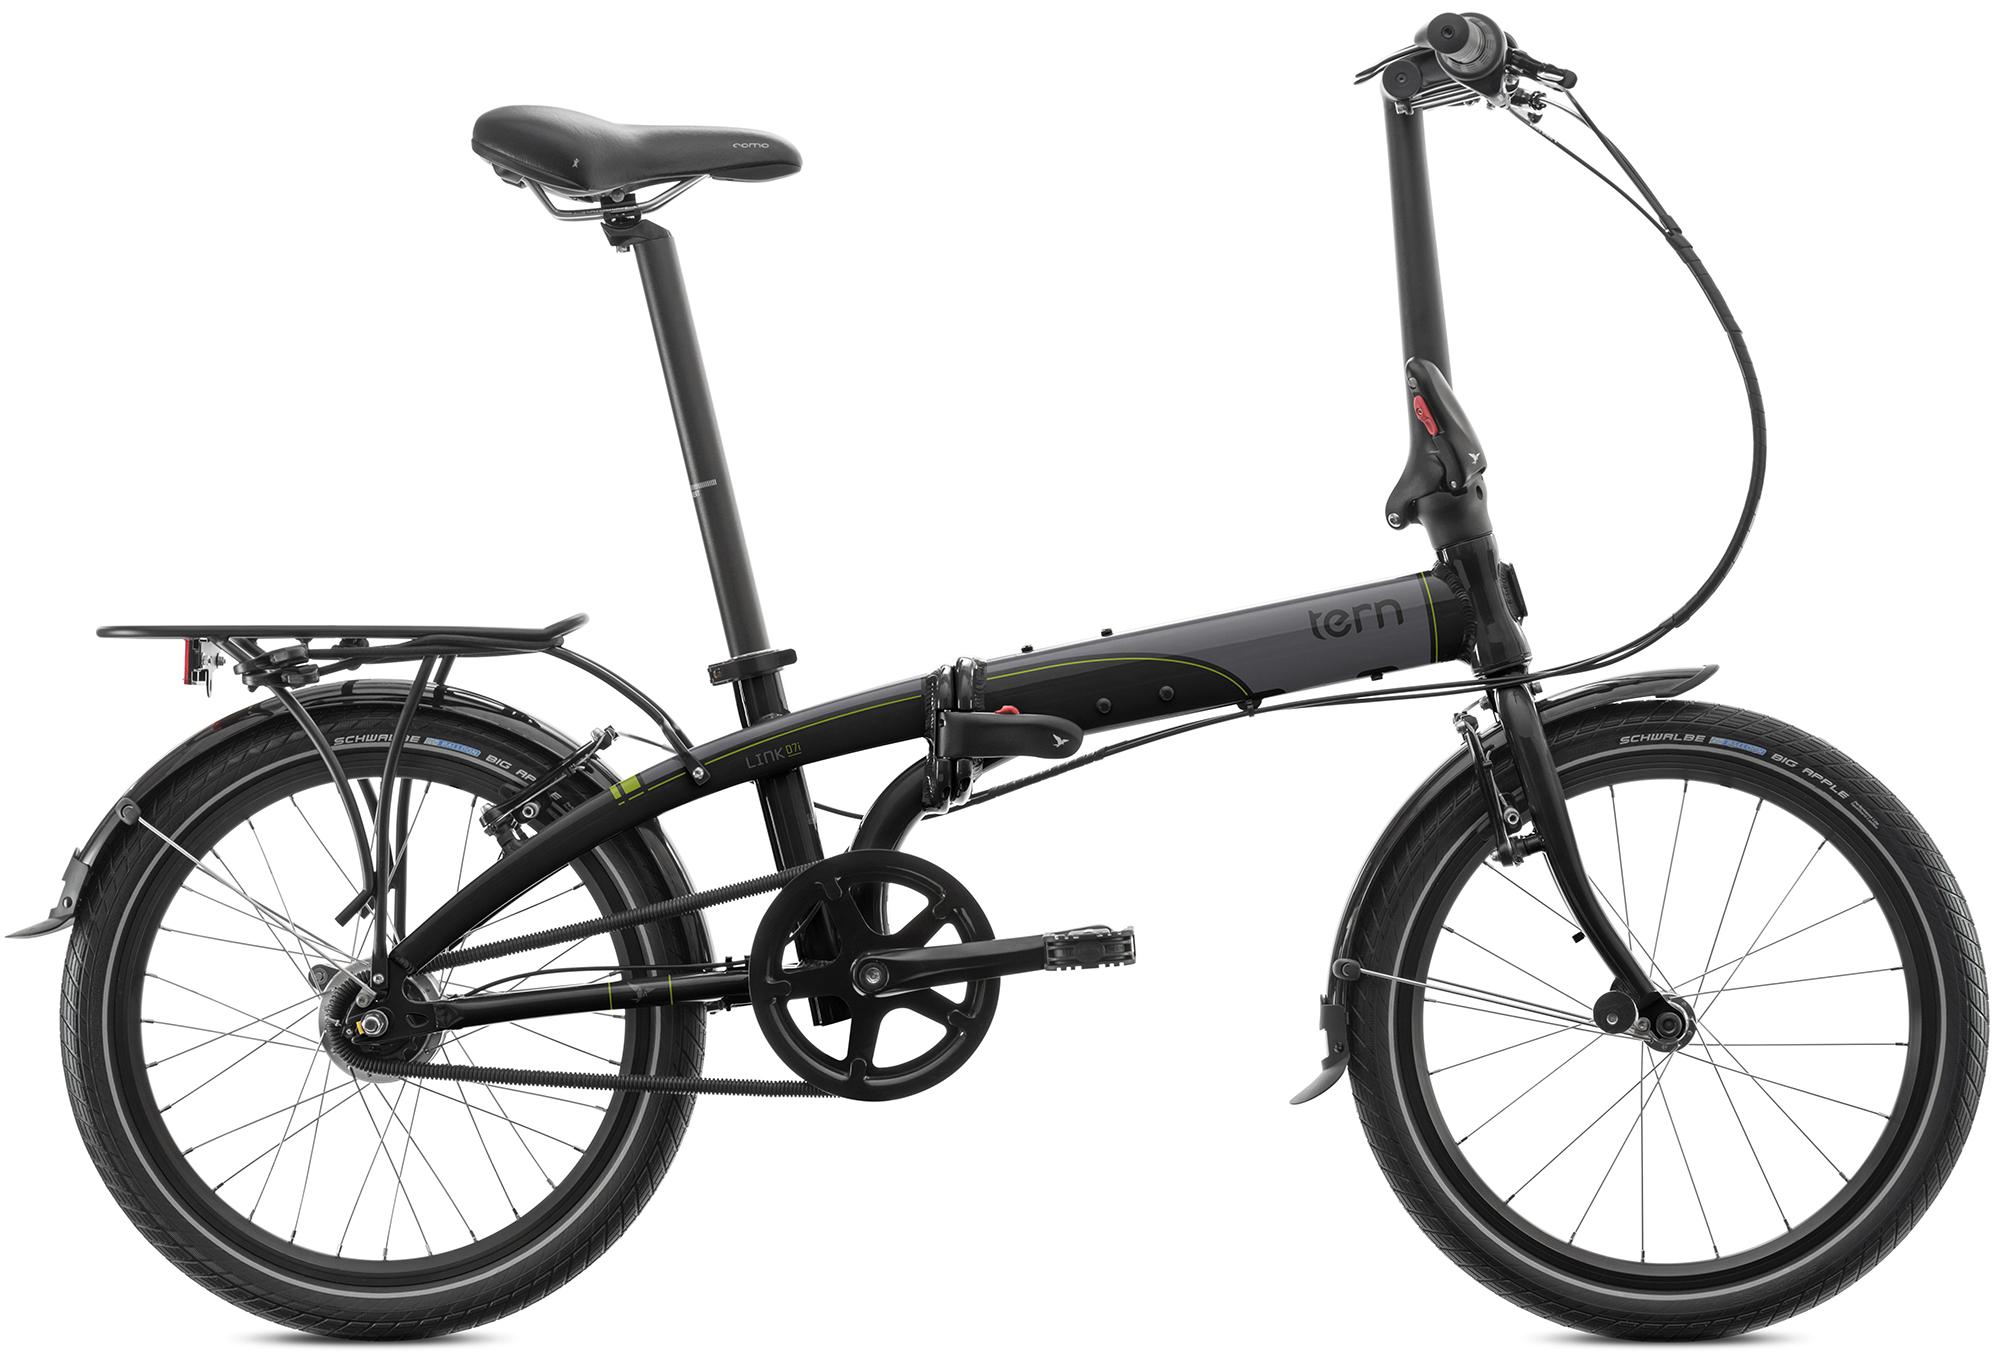 Tern Велосипед складной Tern Link D7i  велосипед tern link uno 2014